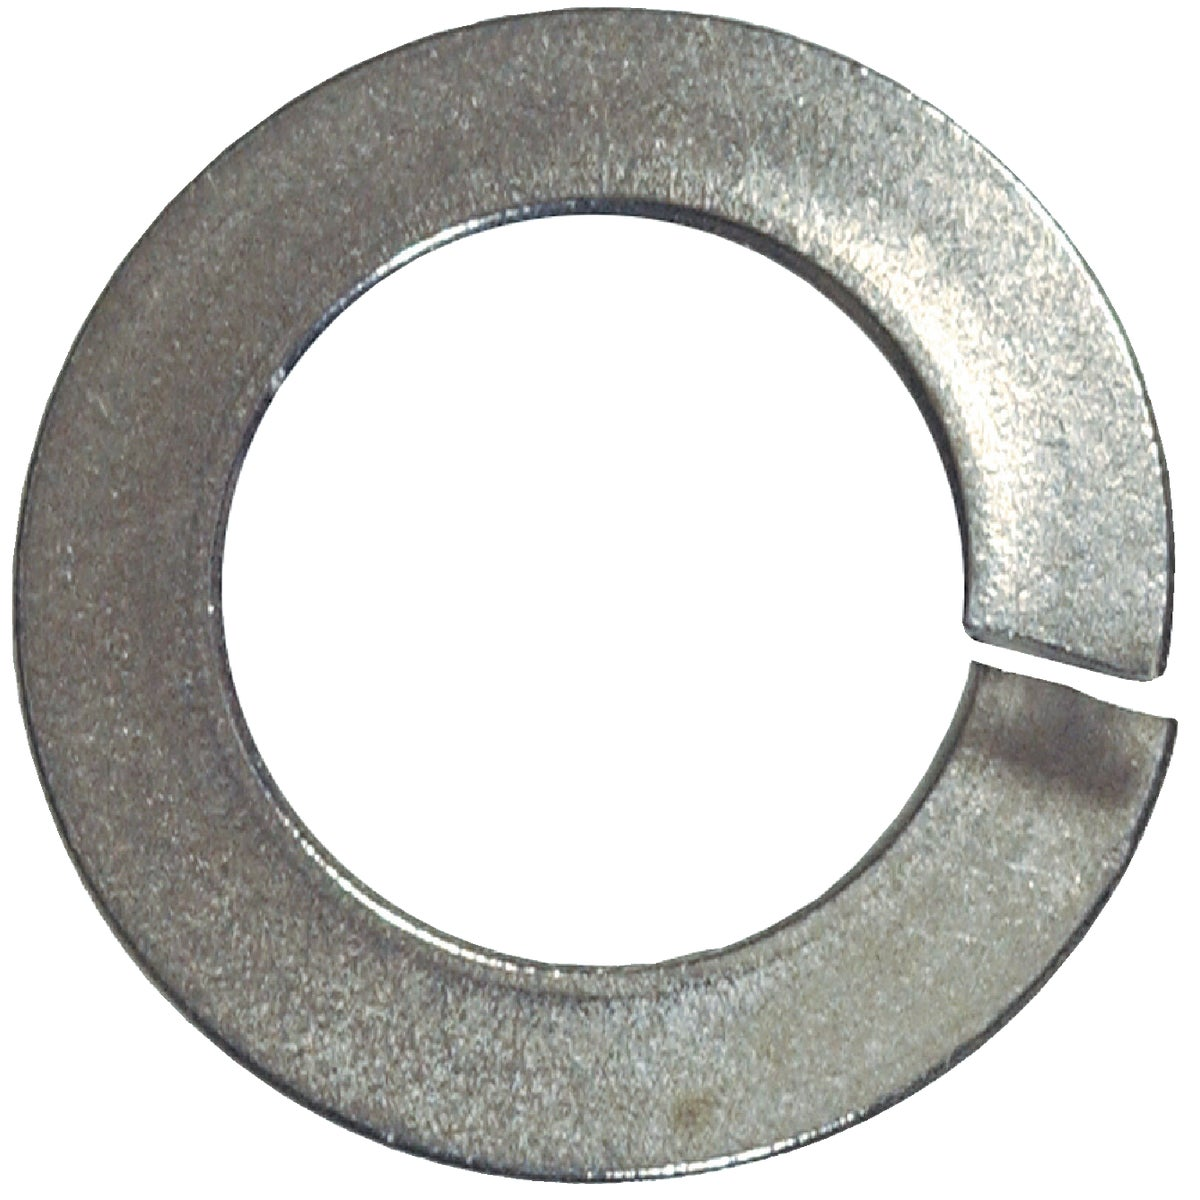 "1/2""SS SPLIT LOCK WASHER - 830674 by Hillman Fastener"